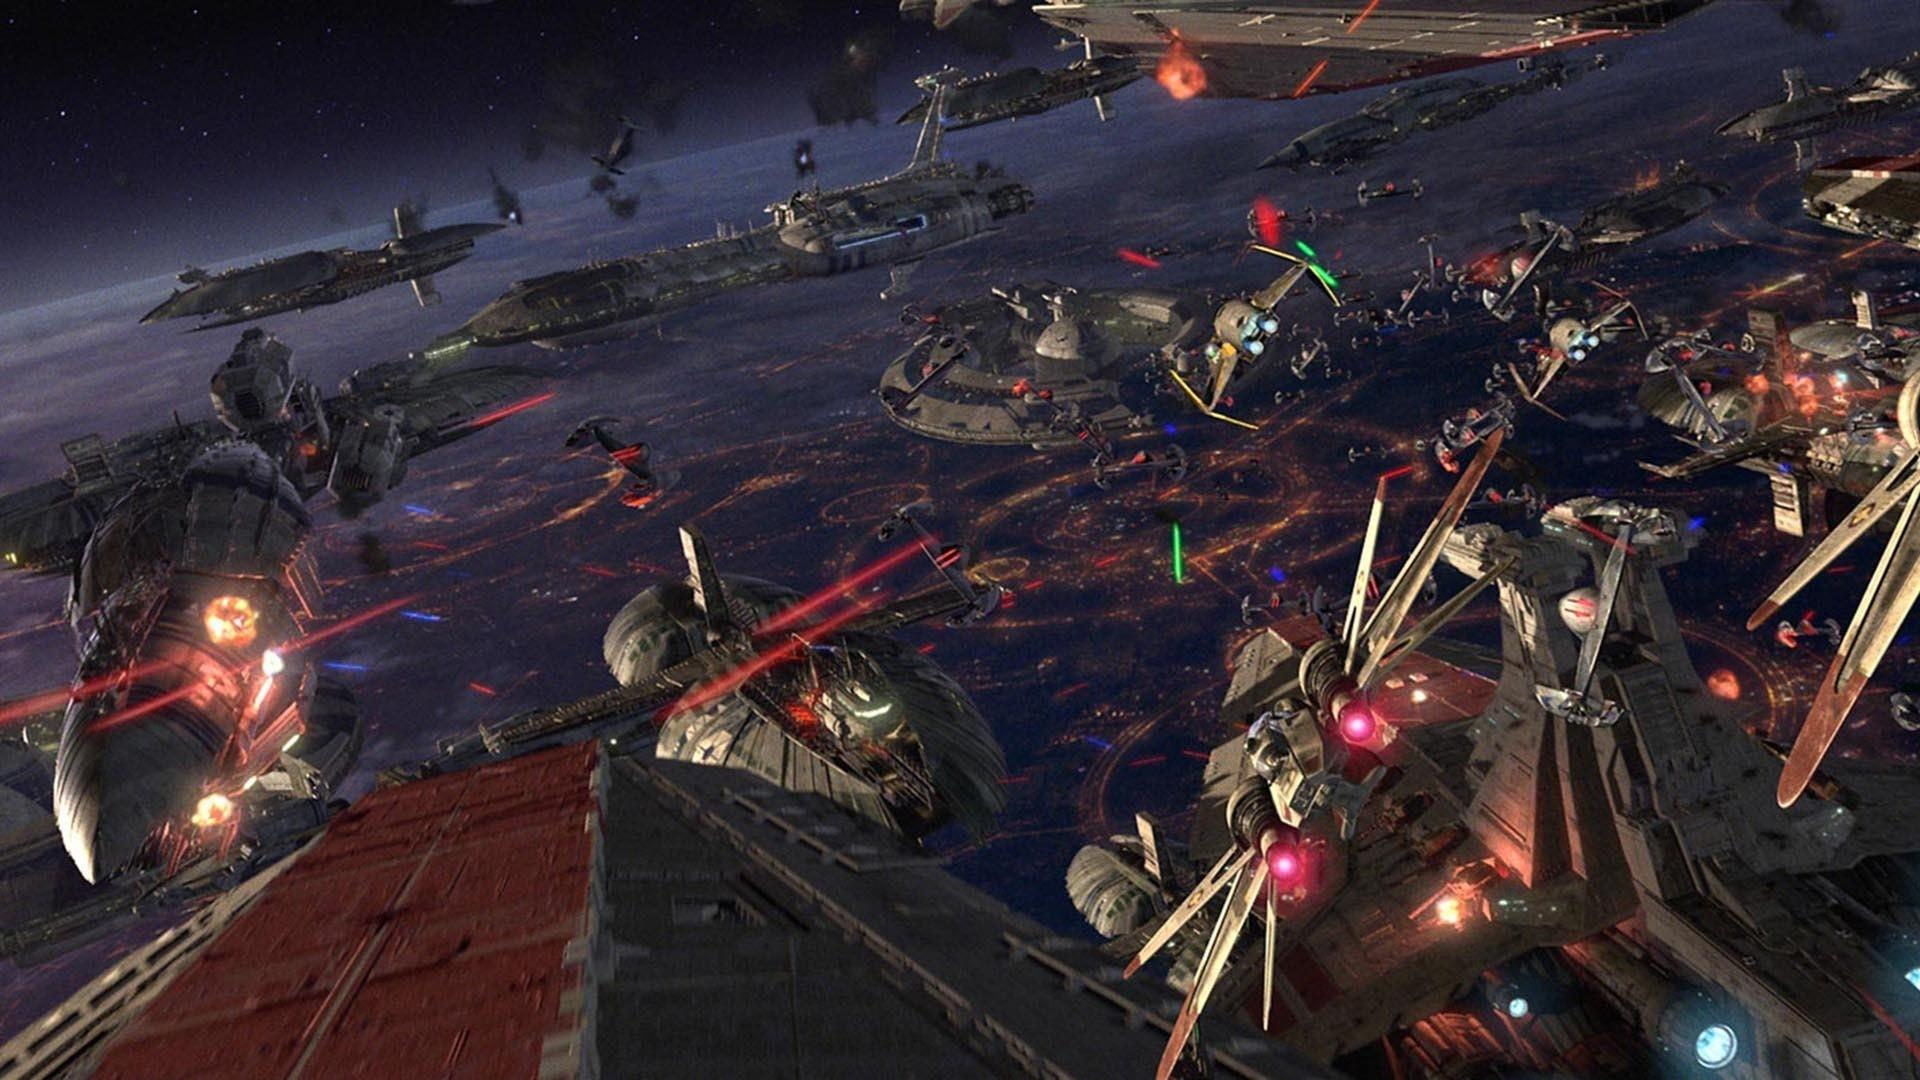 Star Wars Space Battle Wallpaper 61+ images